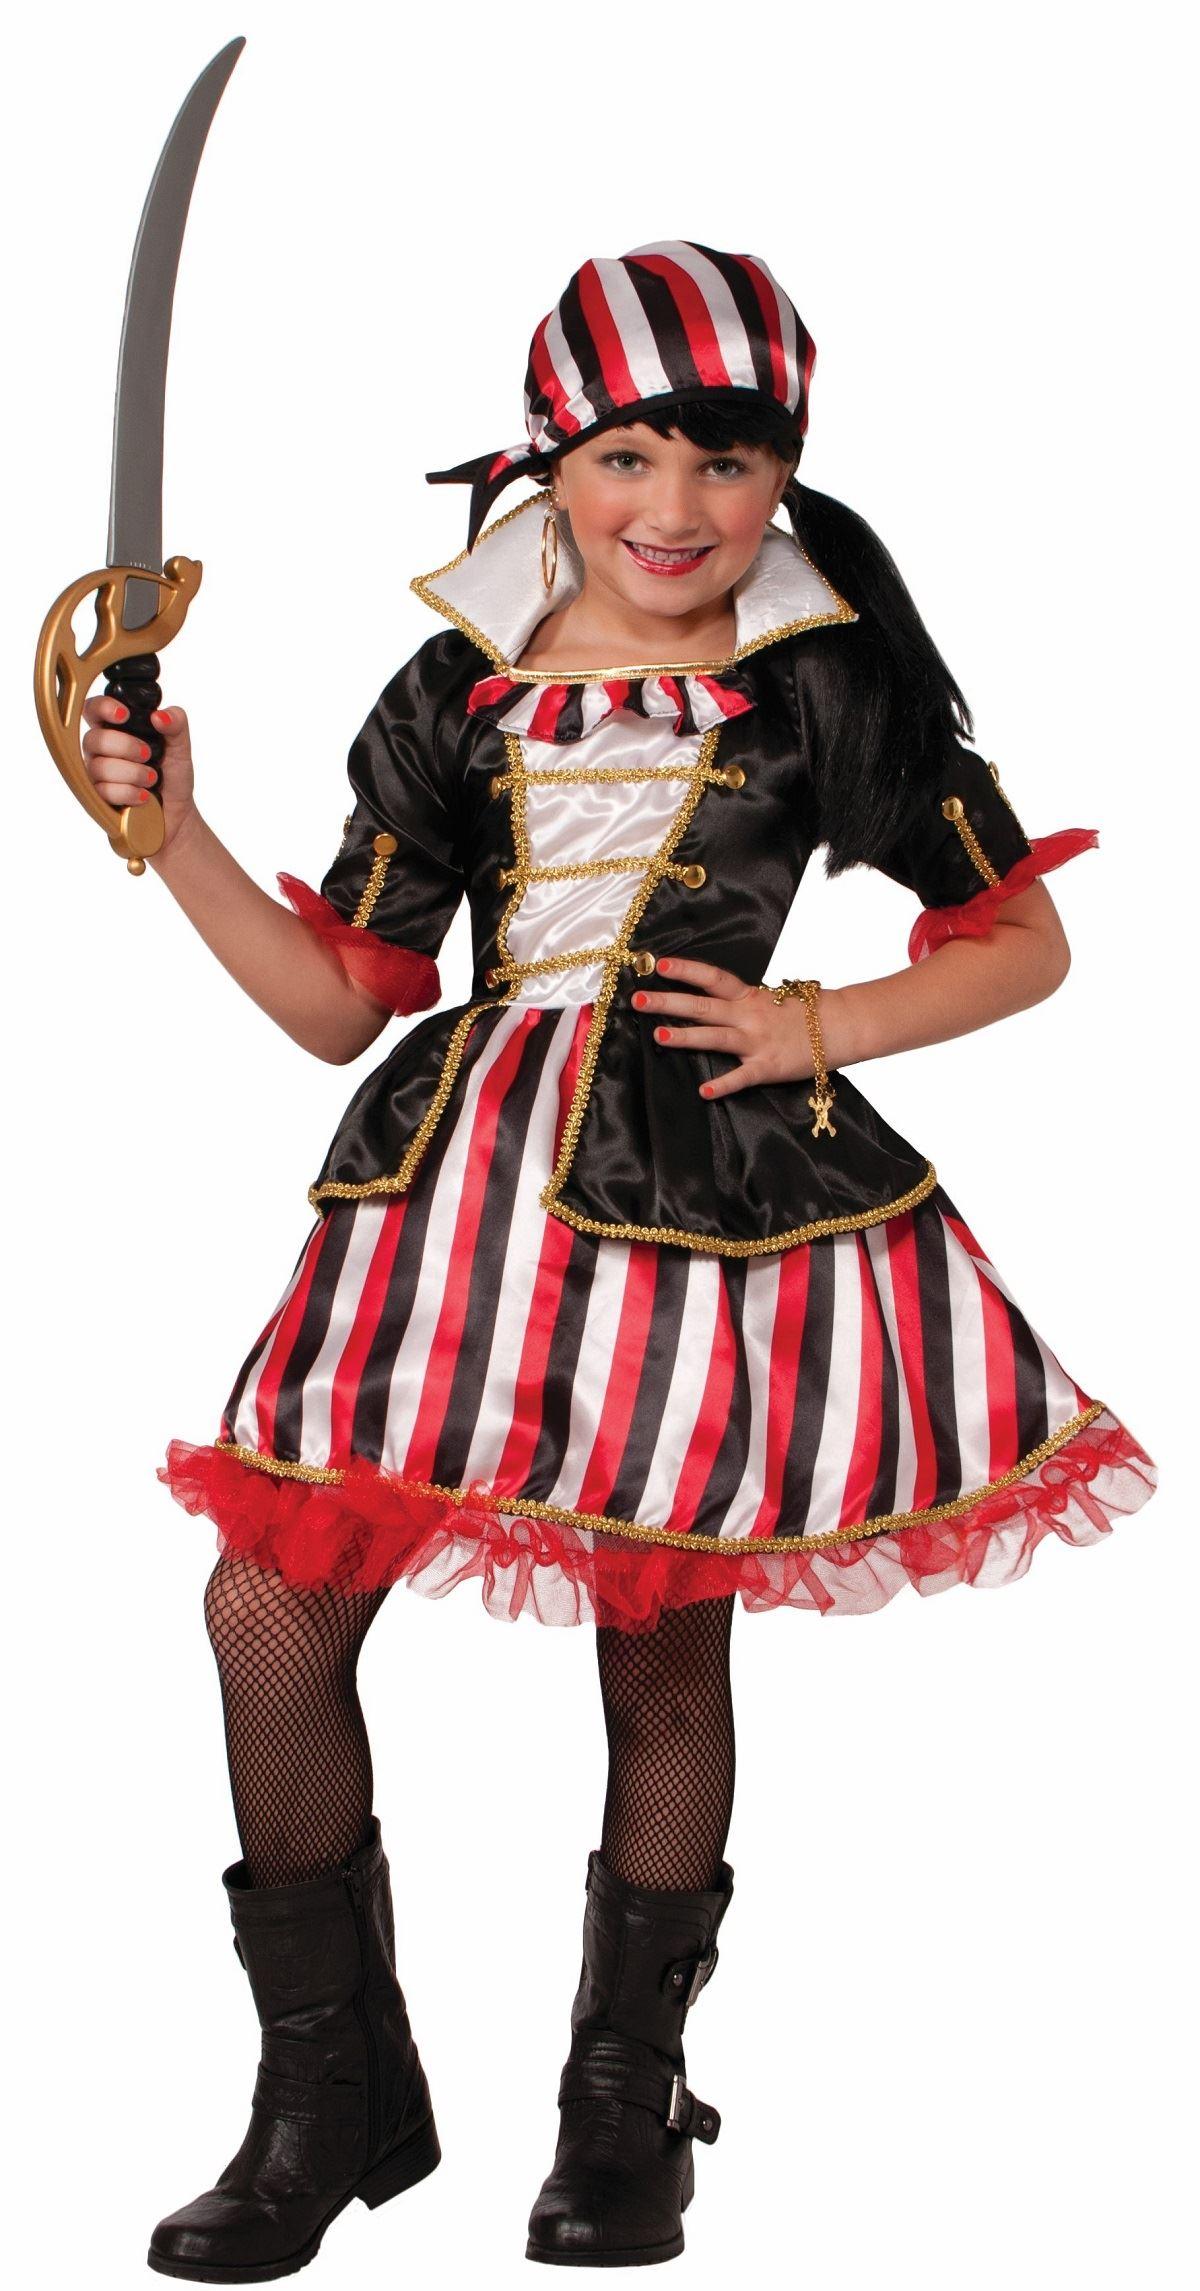 Cute Pirate Costume For Girls